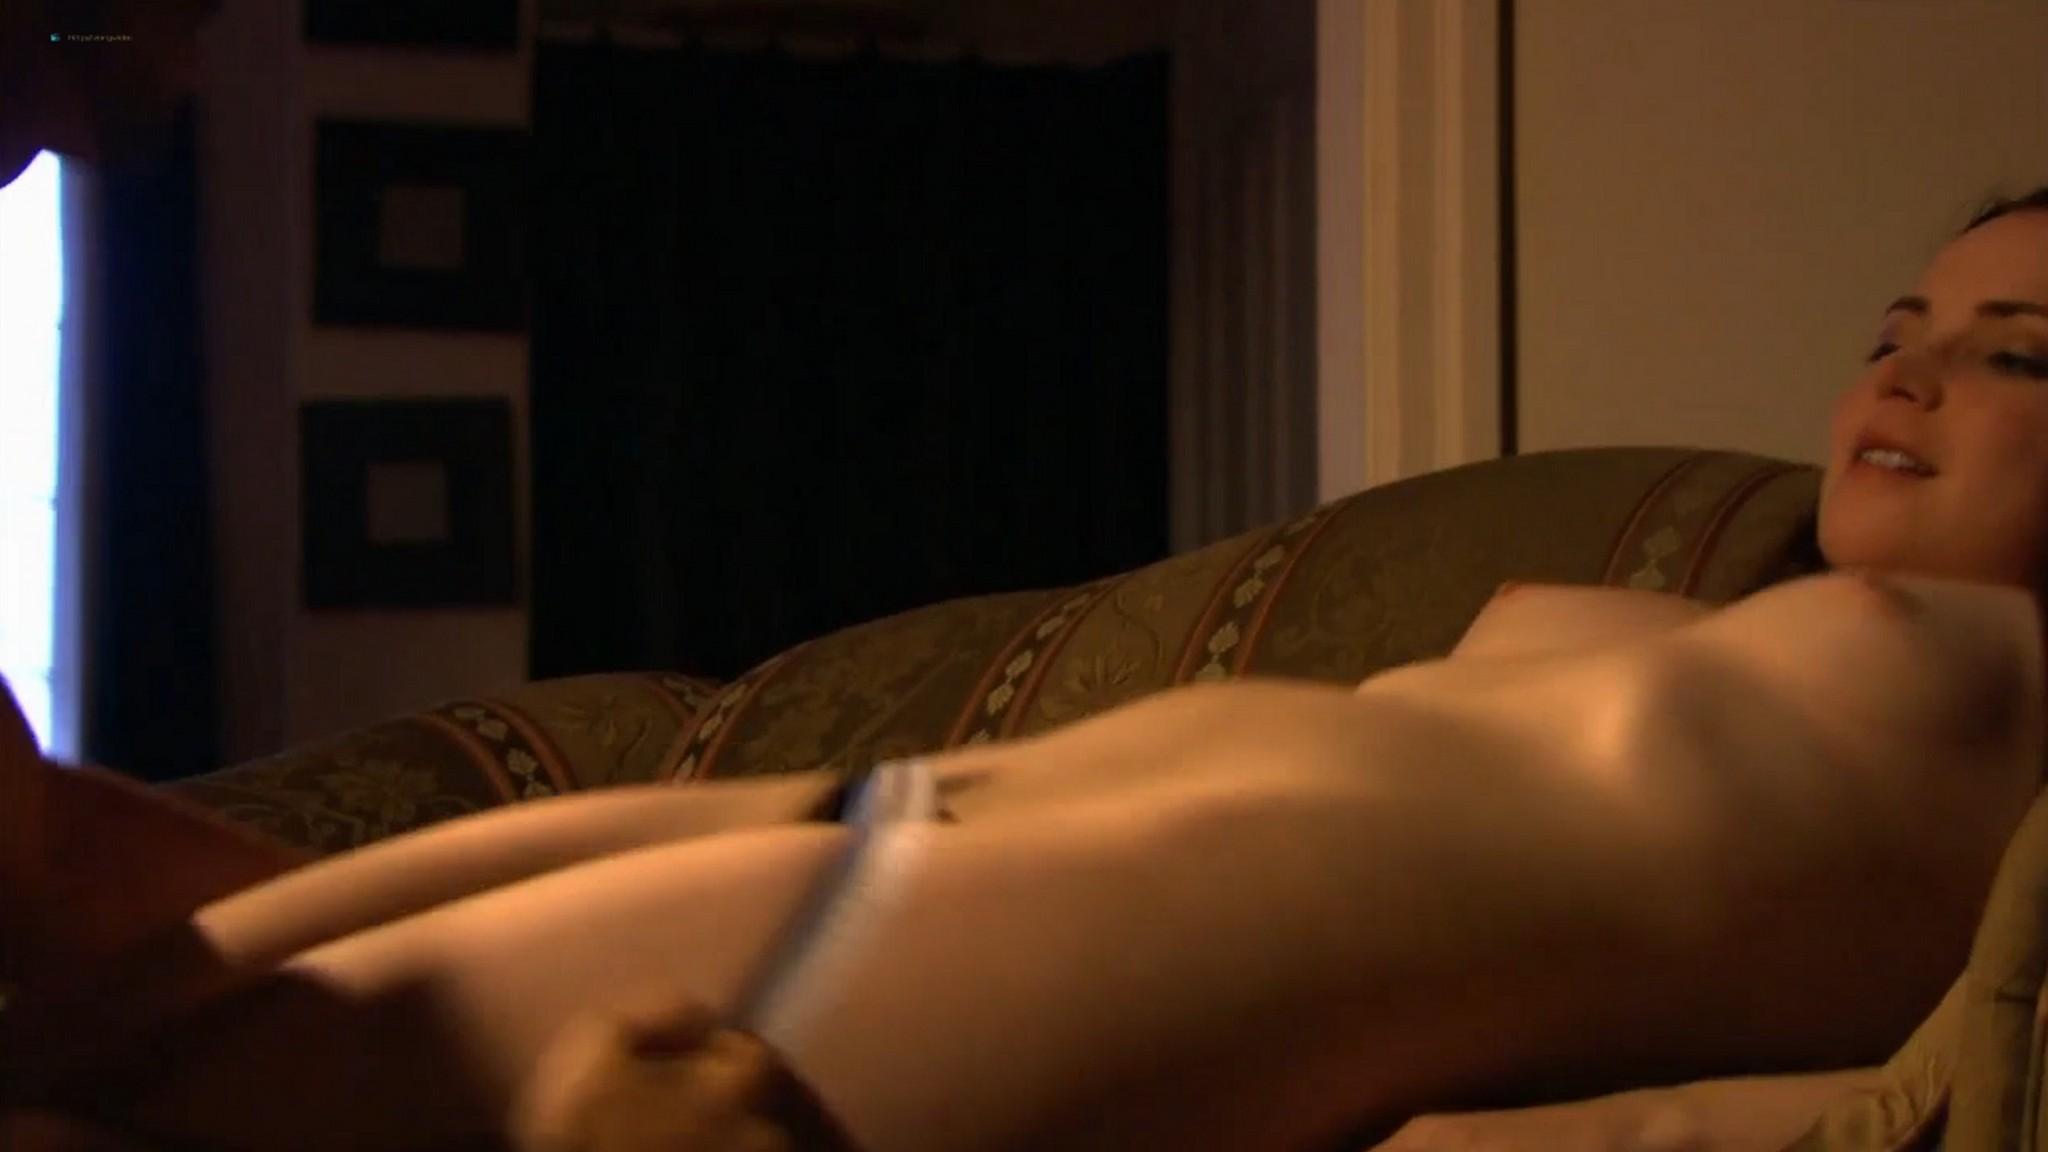 Lana Tailor nude lesbian sex Denise Cobar Erin Brown nude lot of sex Lingerie 2009 s1e11 HD 720p 001